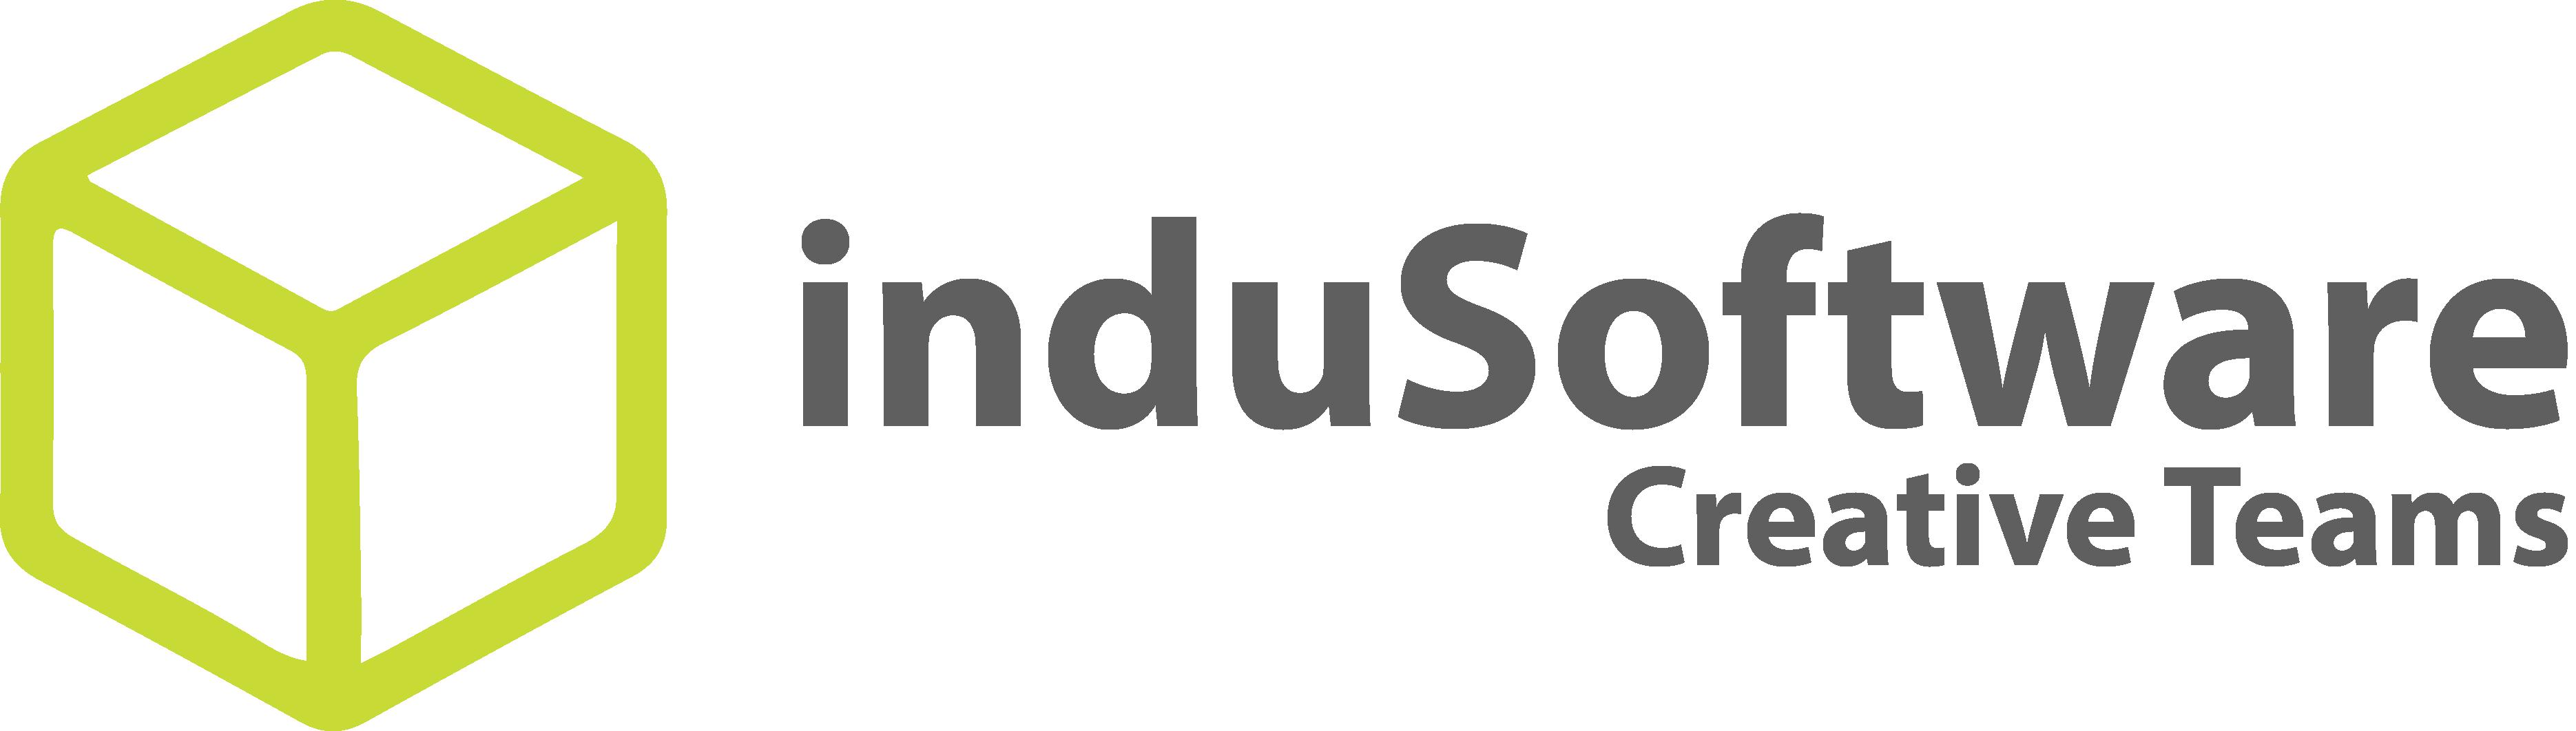 induSoftware